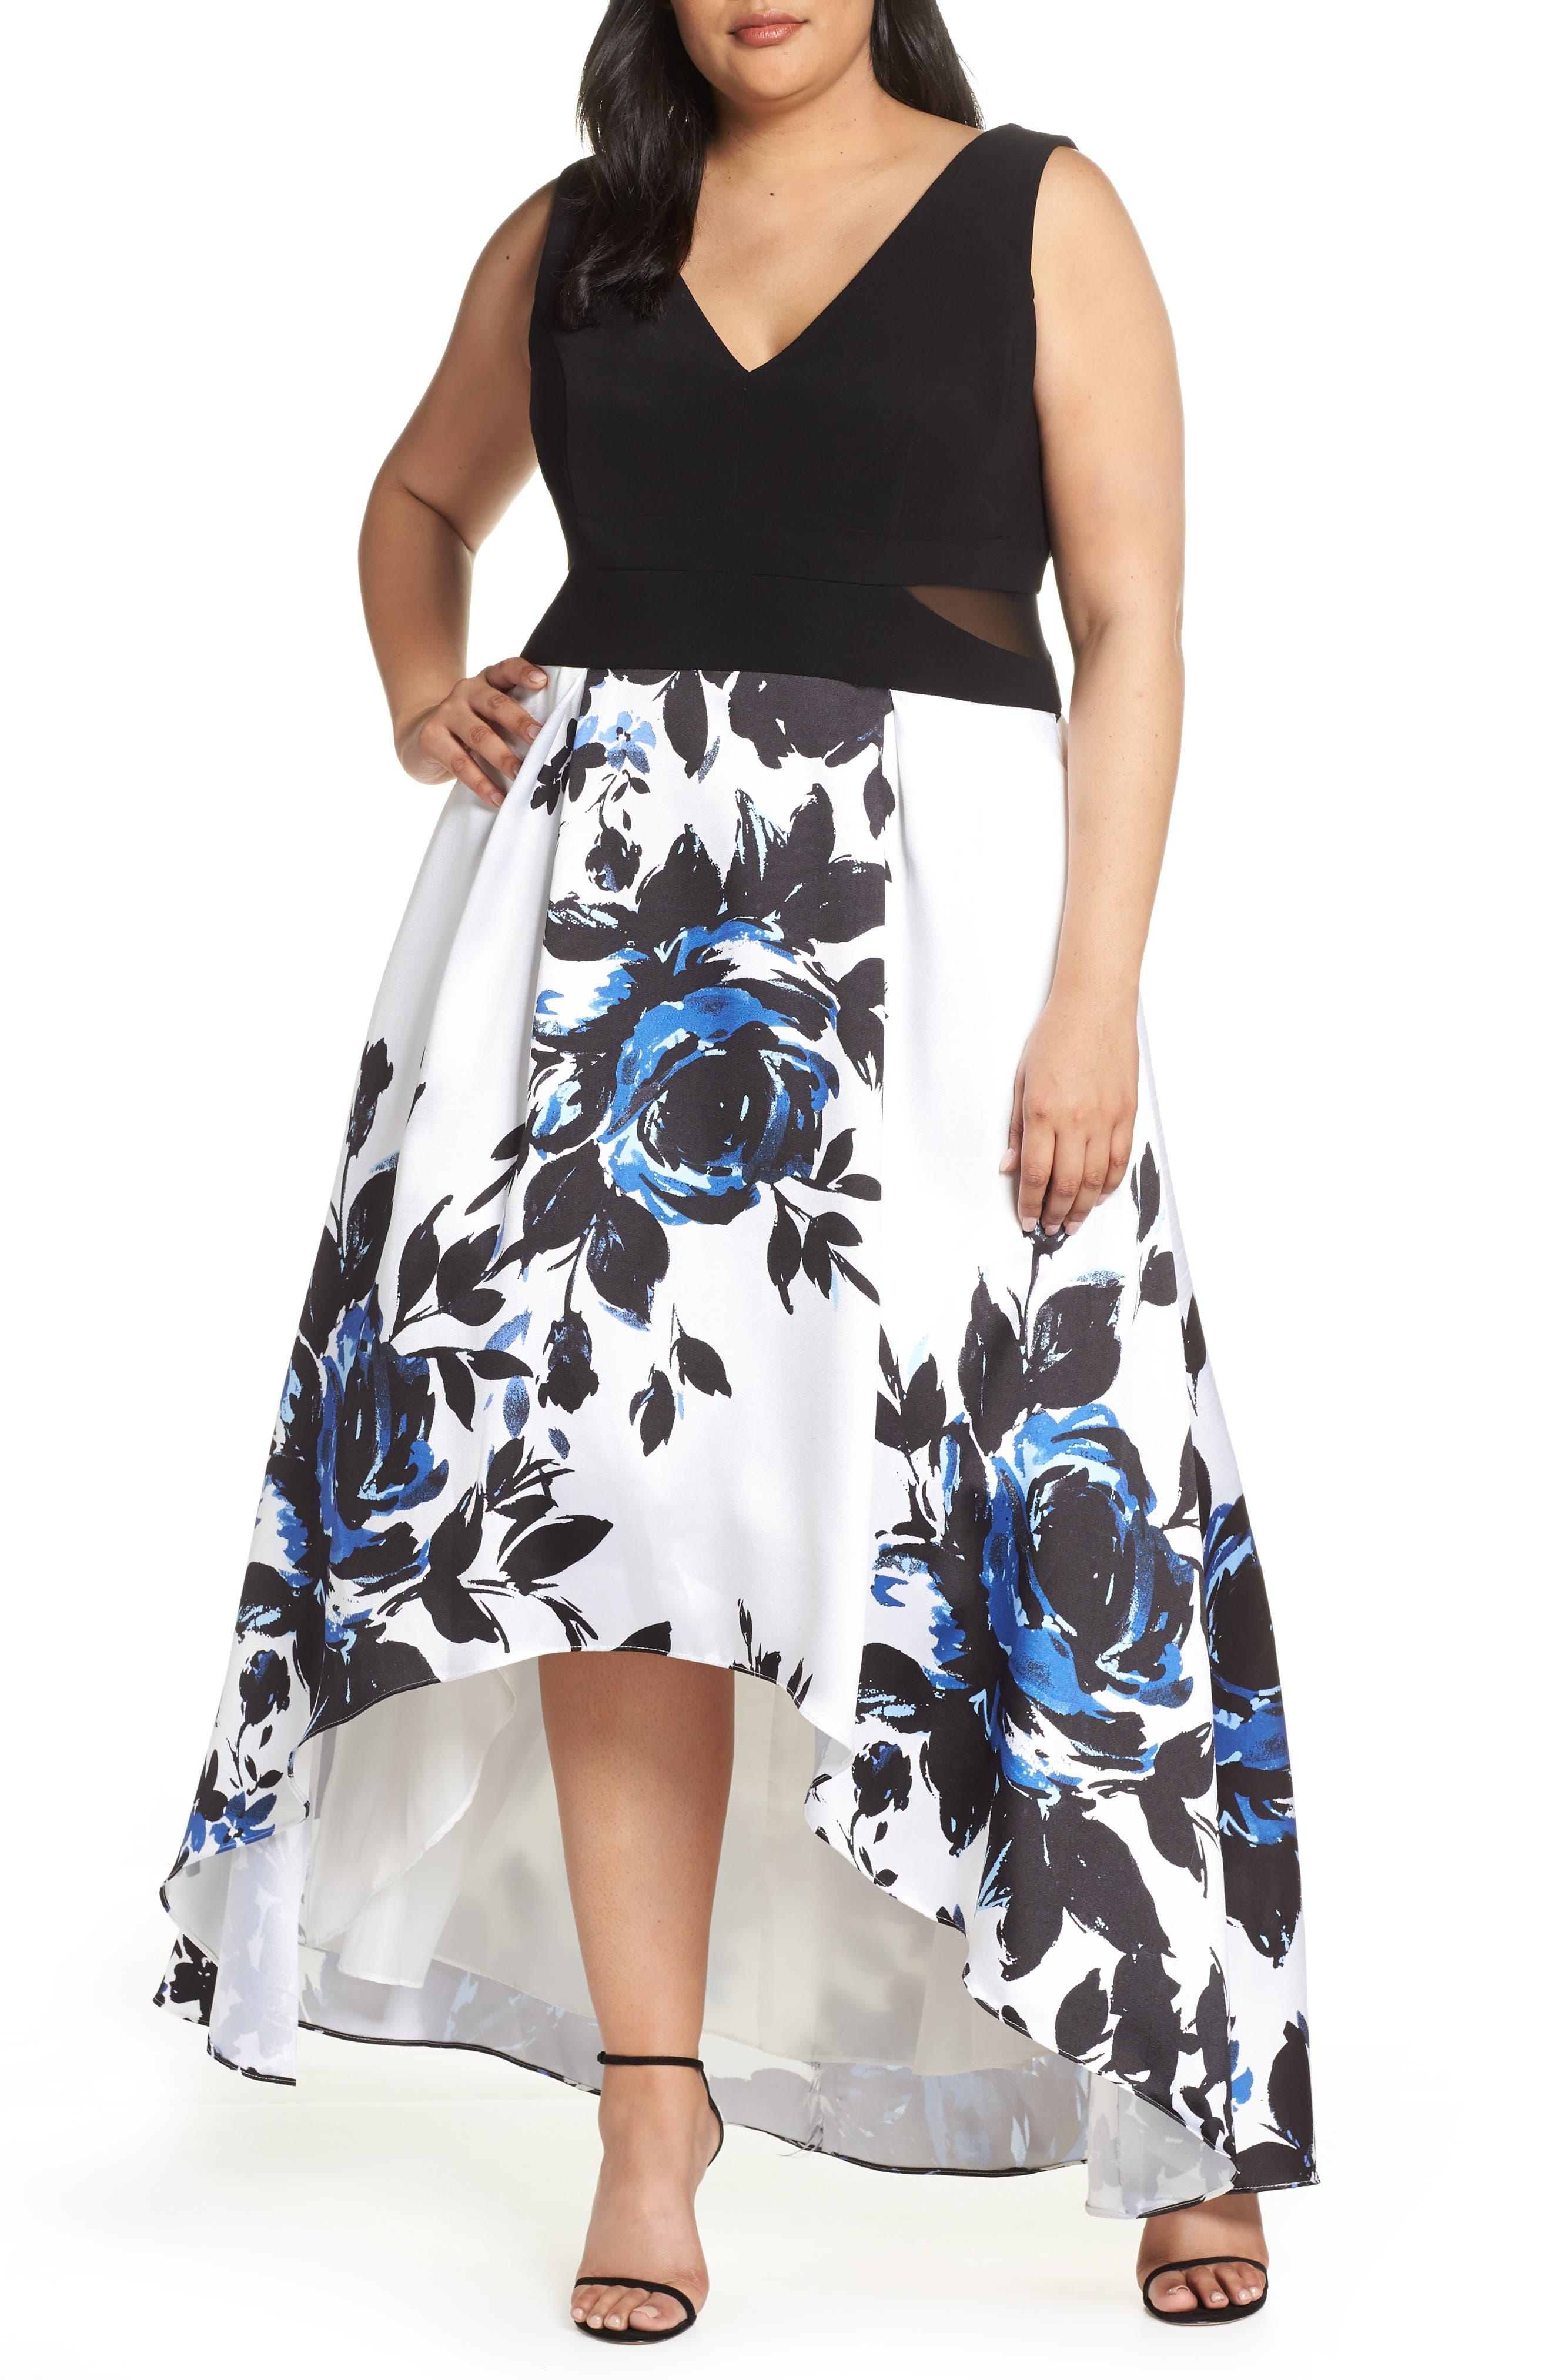 Xscape Maxi Dress